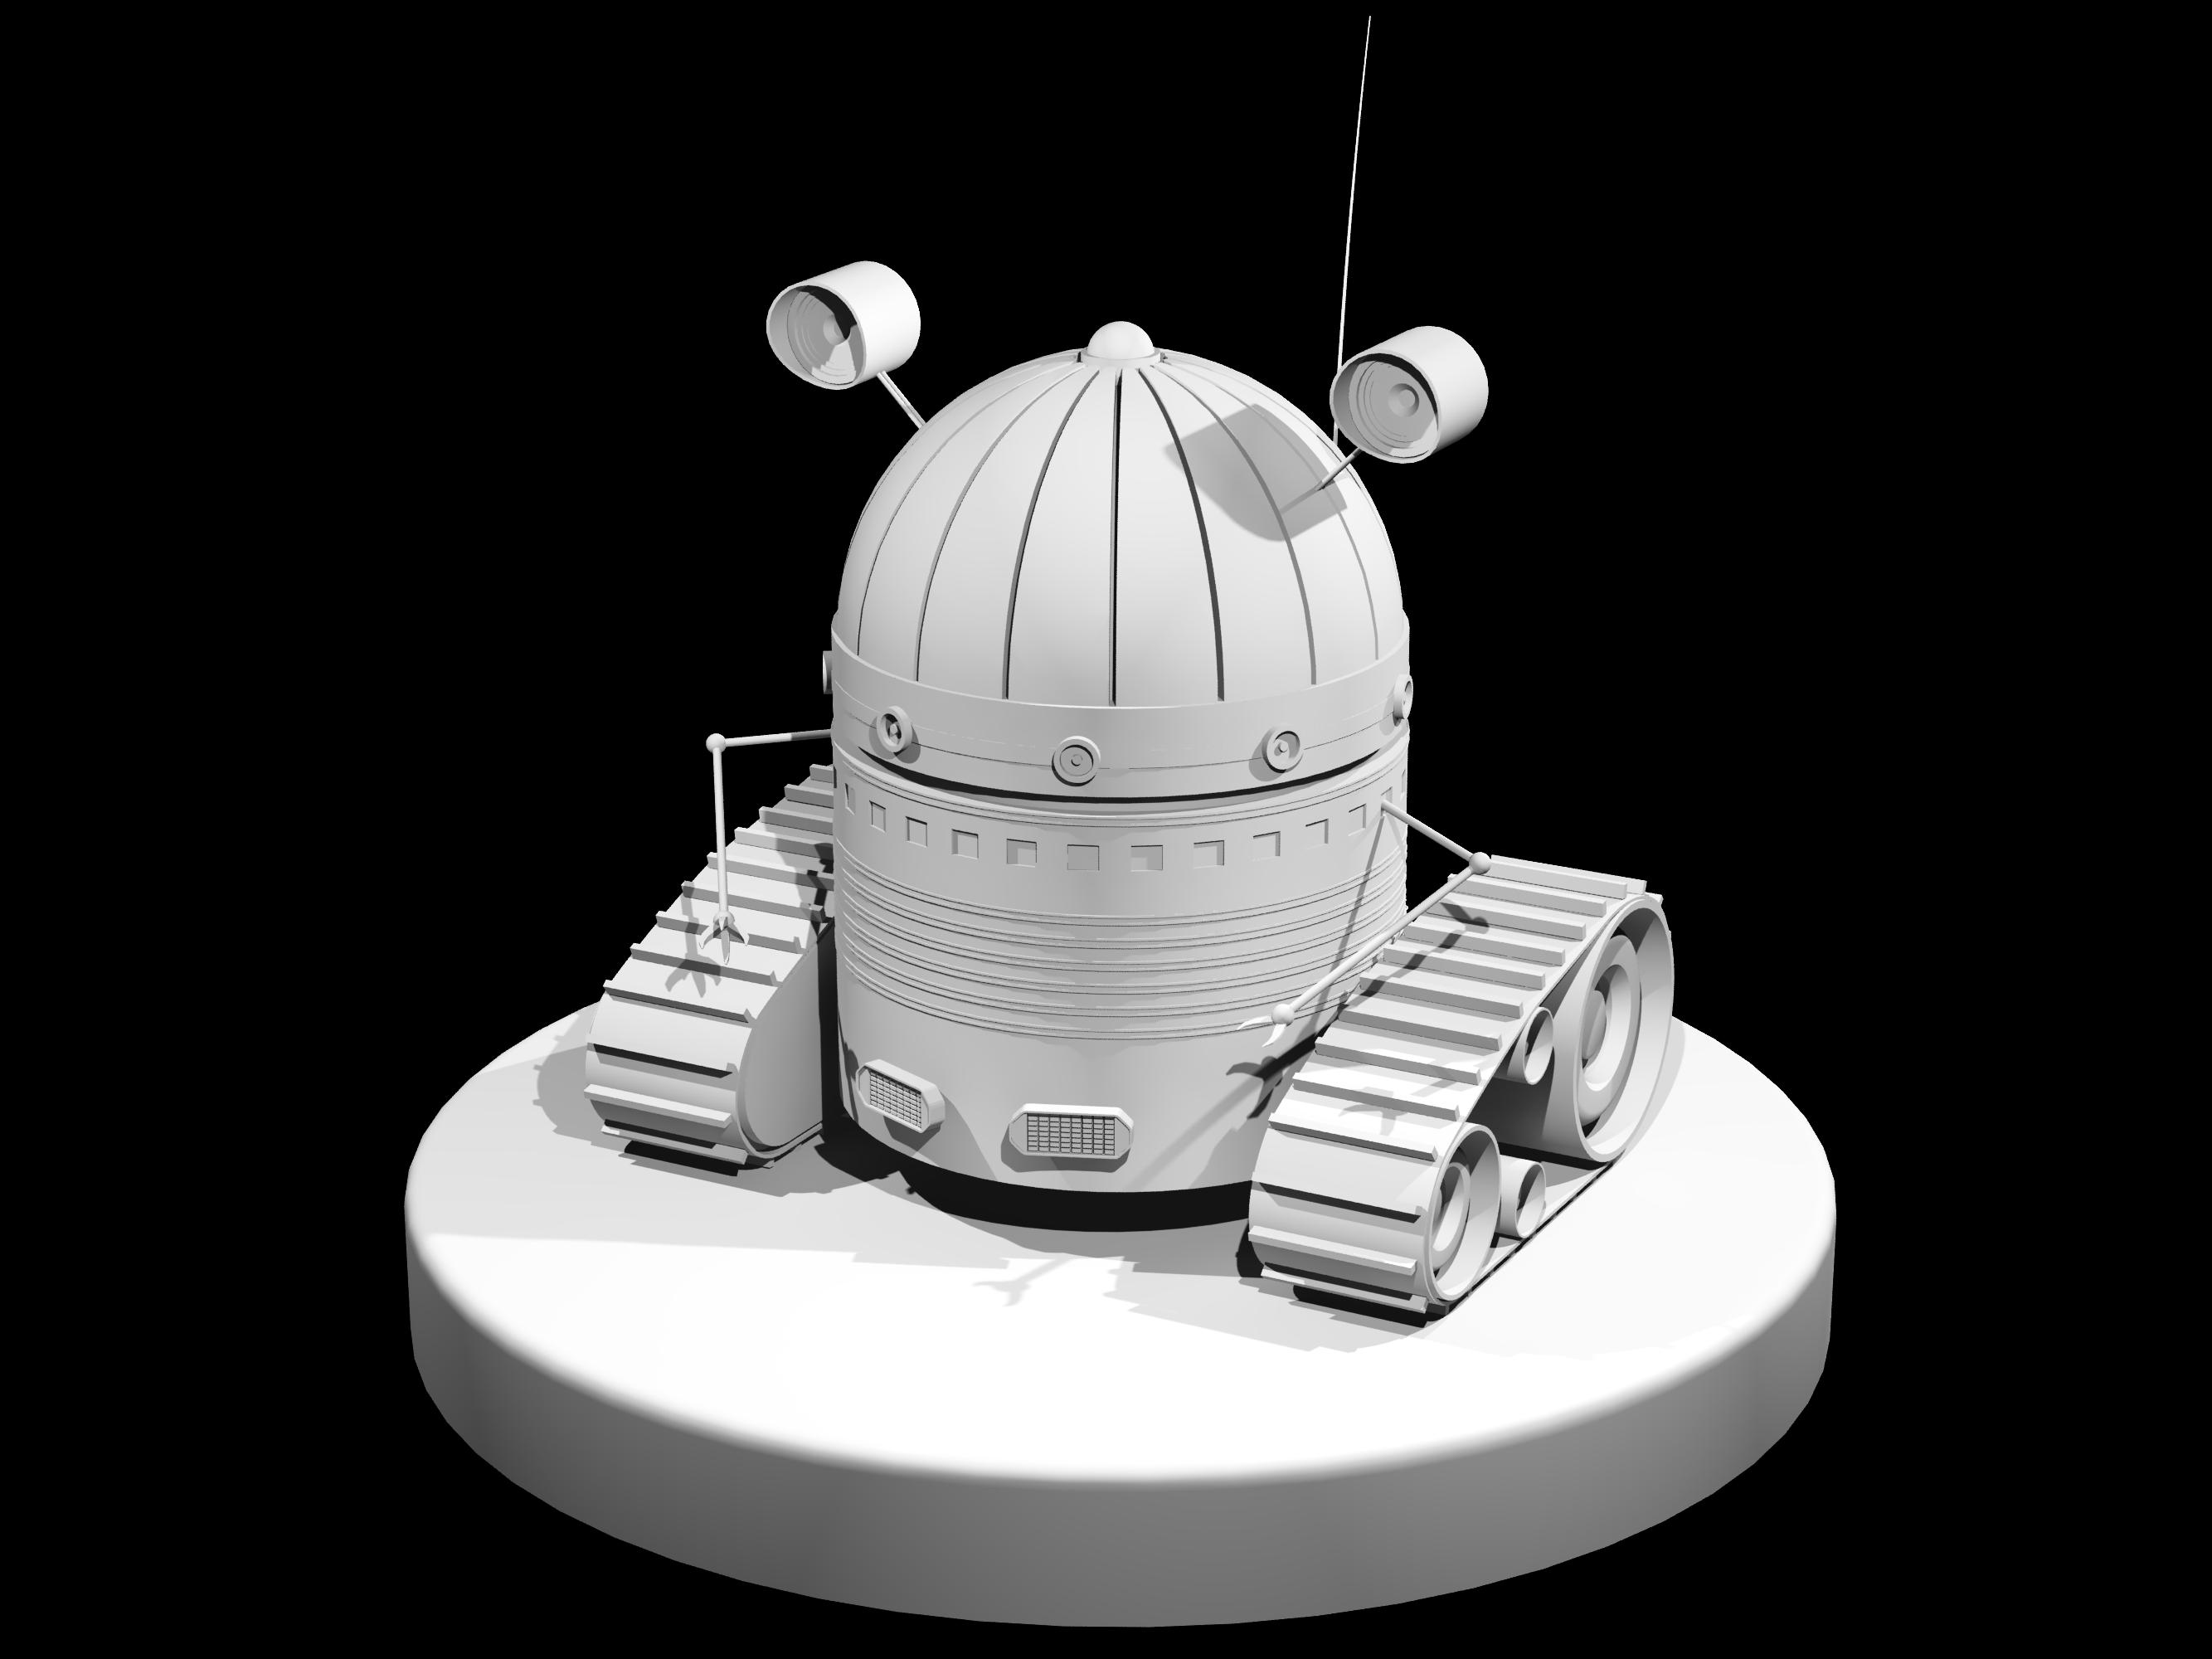 3d art robot wip dystopiartist by dystopiartist on deviantart. Black Bedroom Furniture Sets. Home Design Ideas